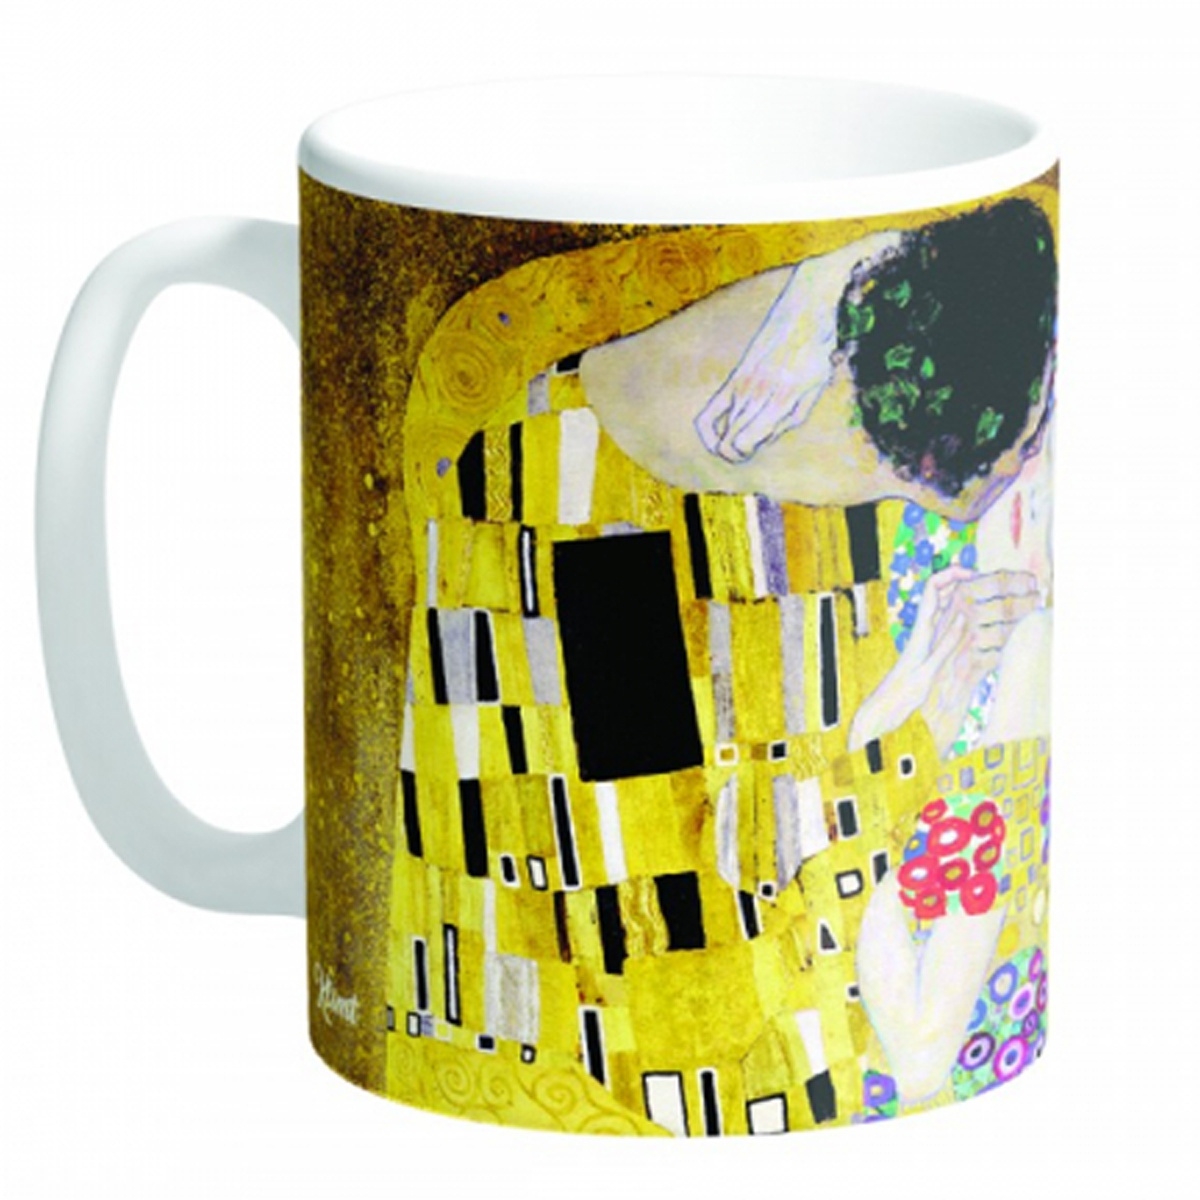 Mug céramique \'Gustav Klimt\' (le Baiser) - 95x8 cm - [R1995]